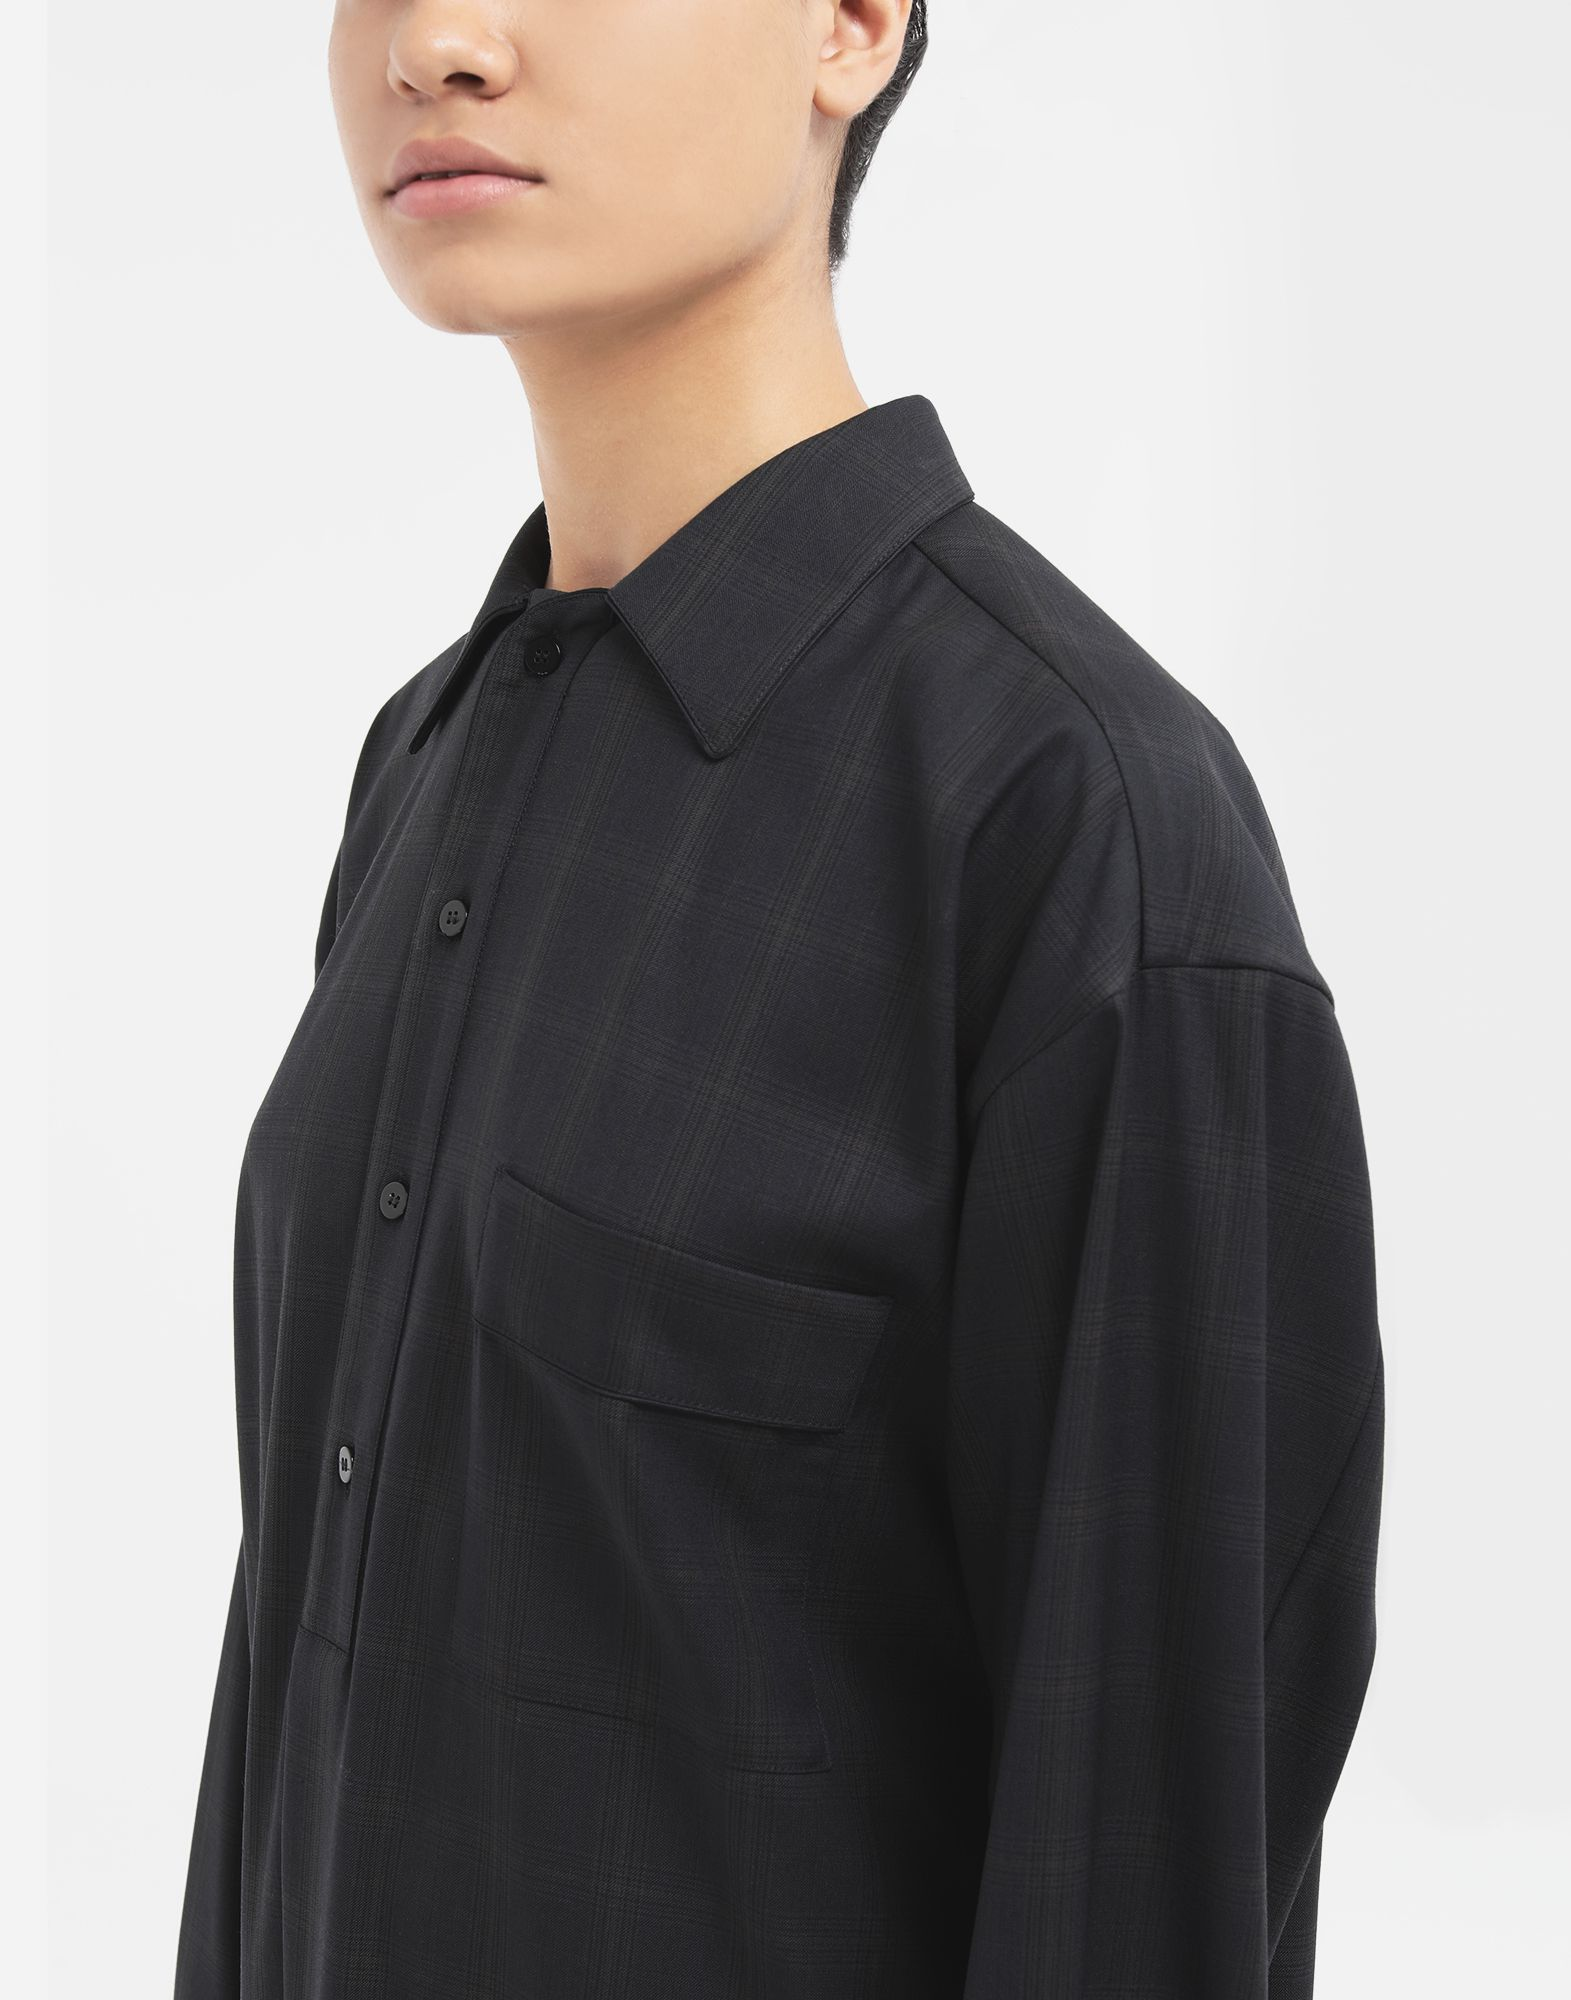 MAISON MARGIELA Kariertes Hemdkleid aus Wolle Kleid Dame a